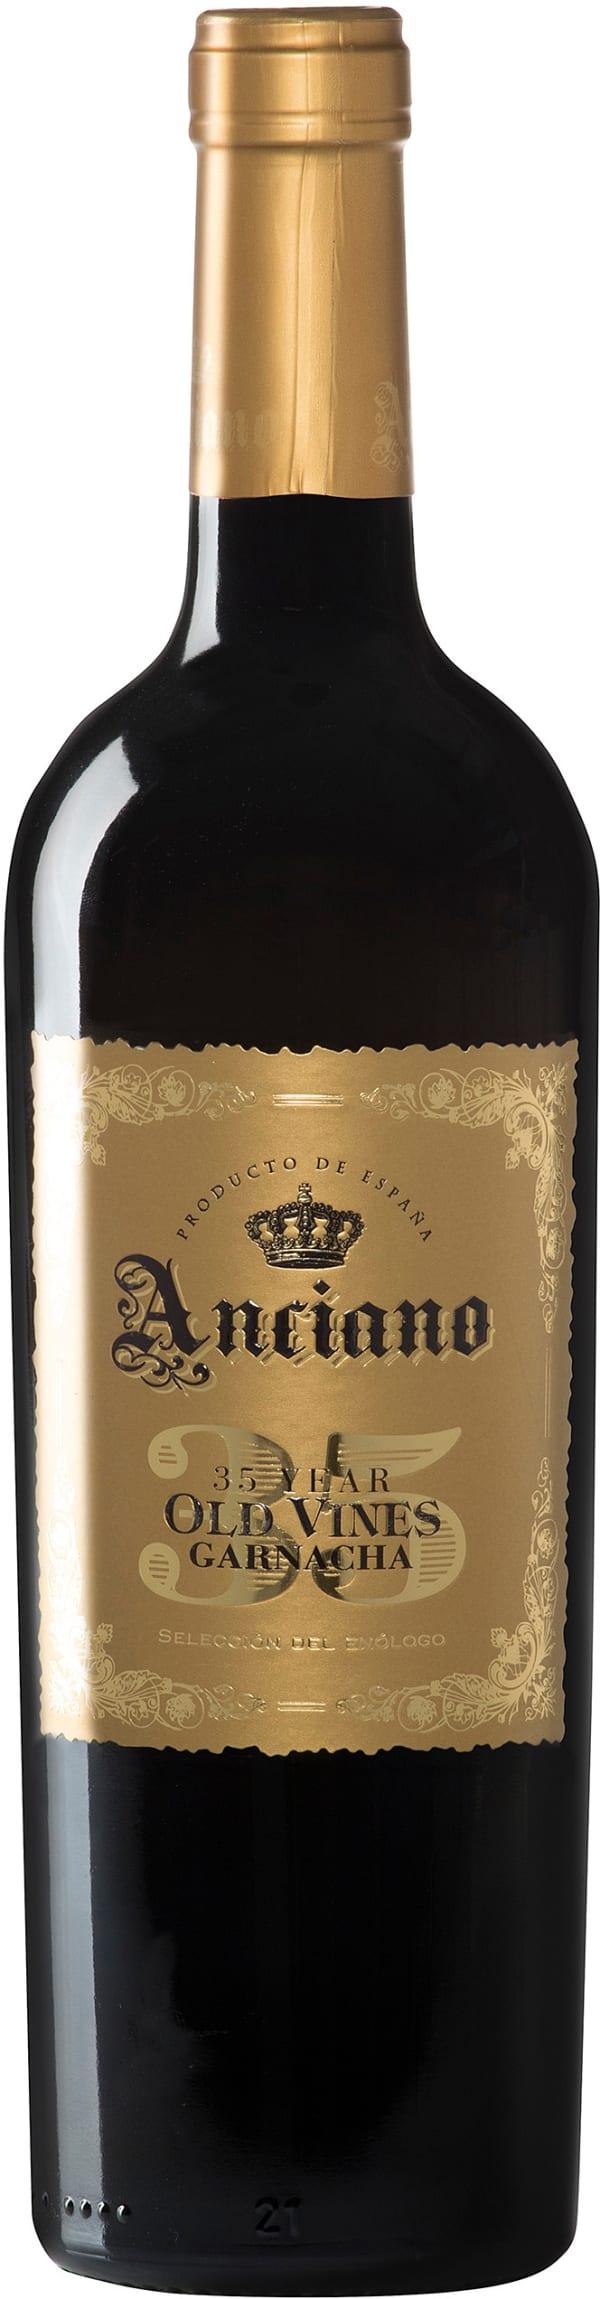 Anciano 35 Year Old Vines Garnacha  2016